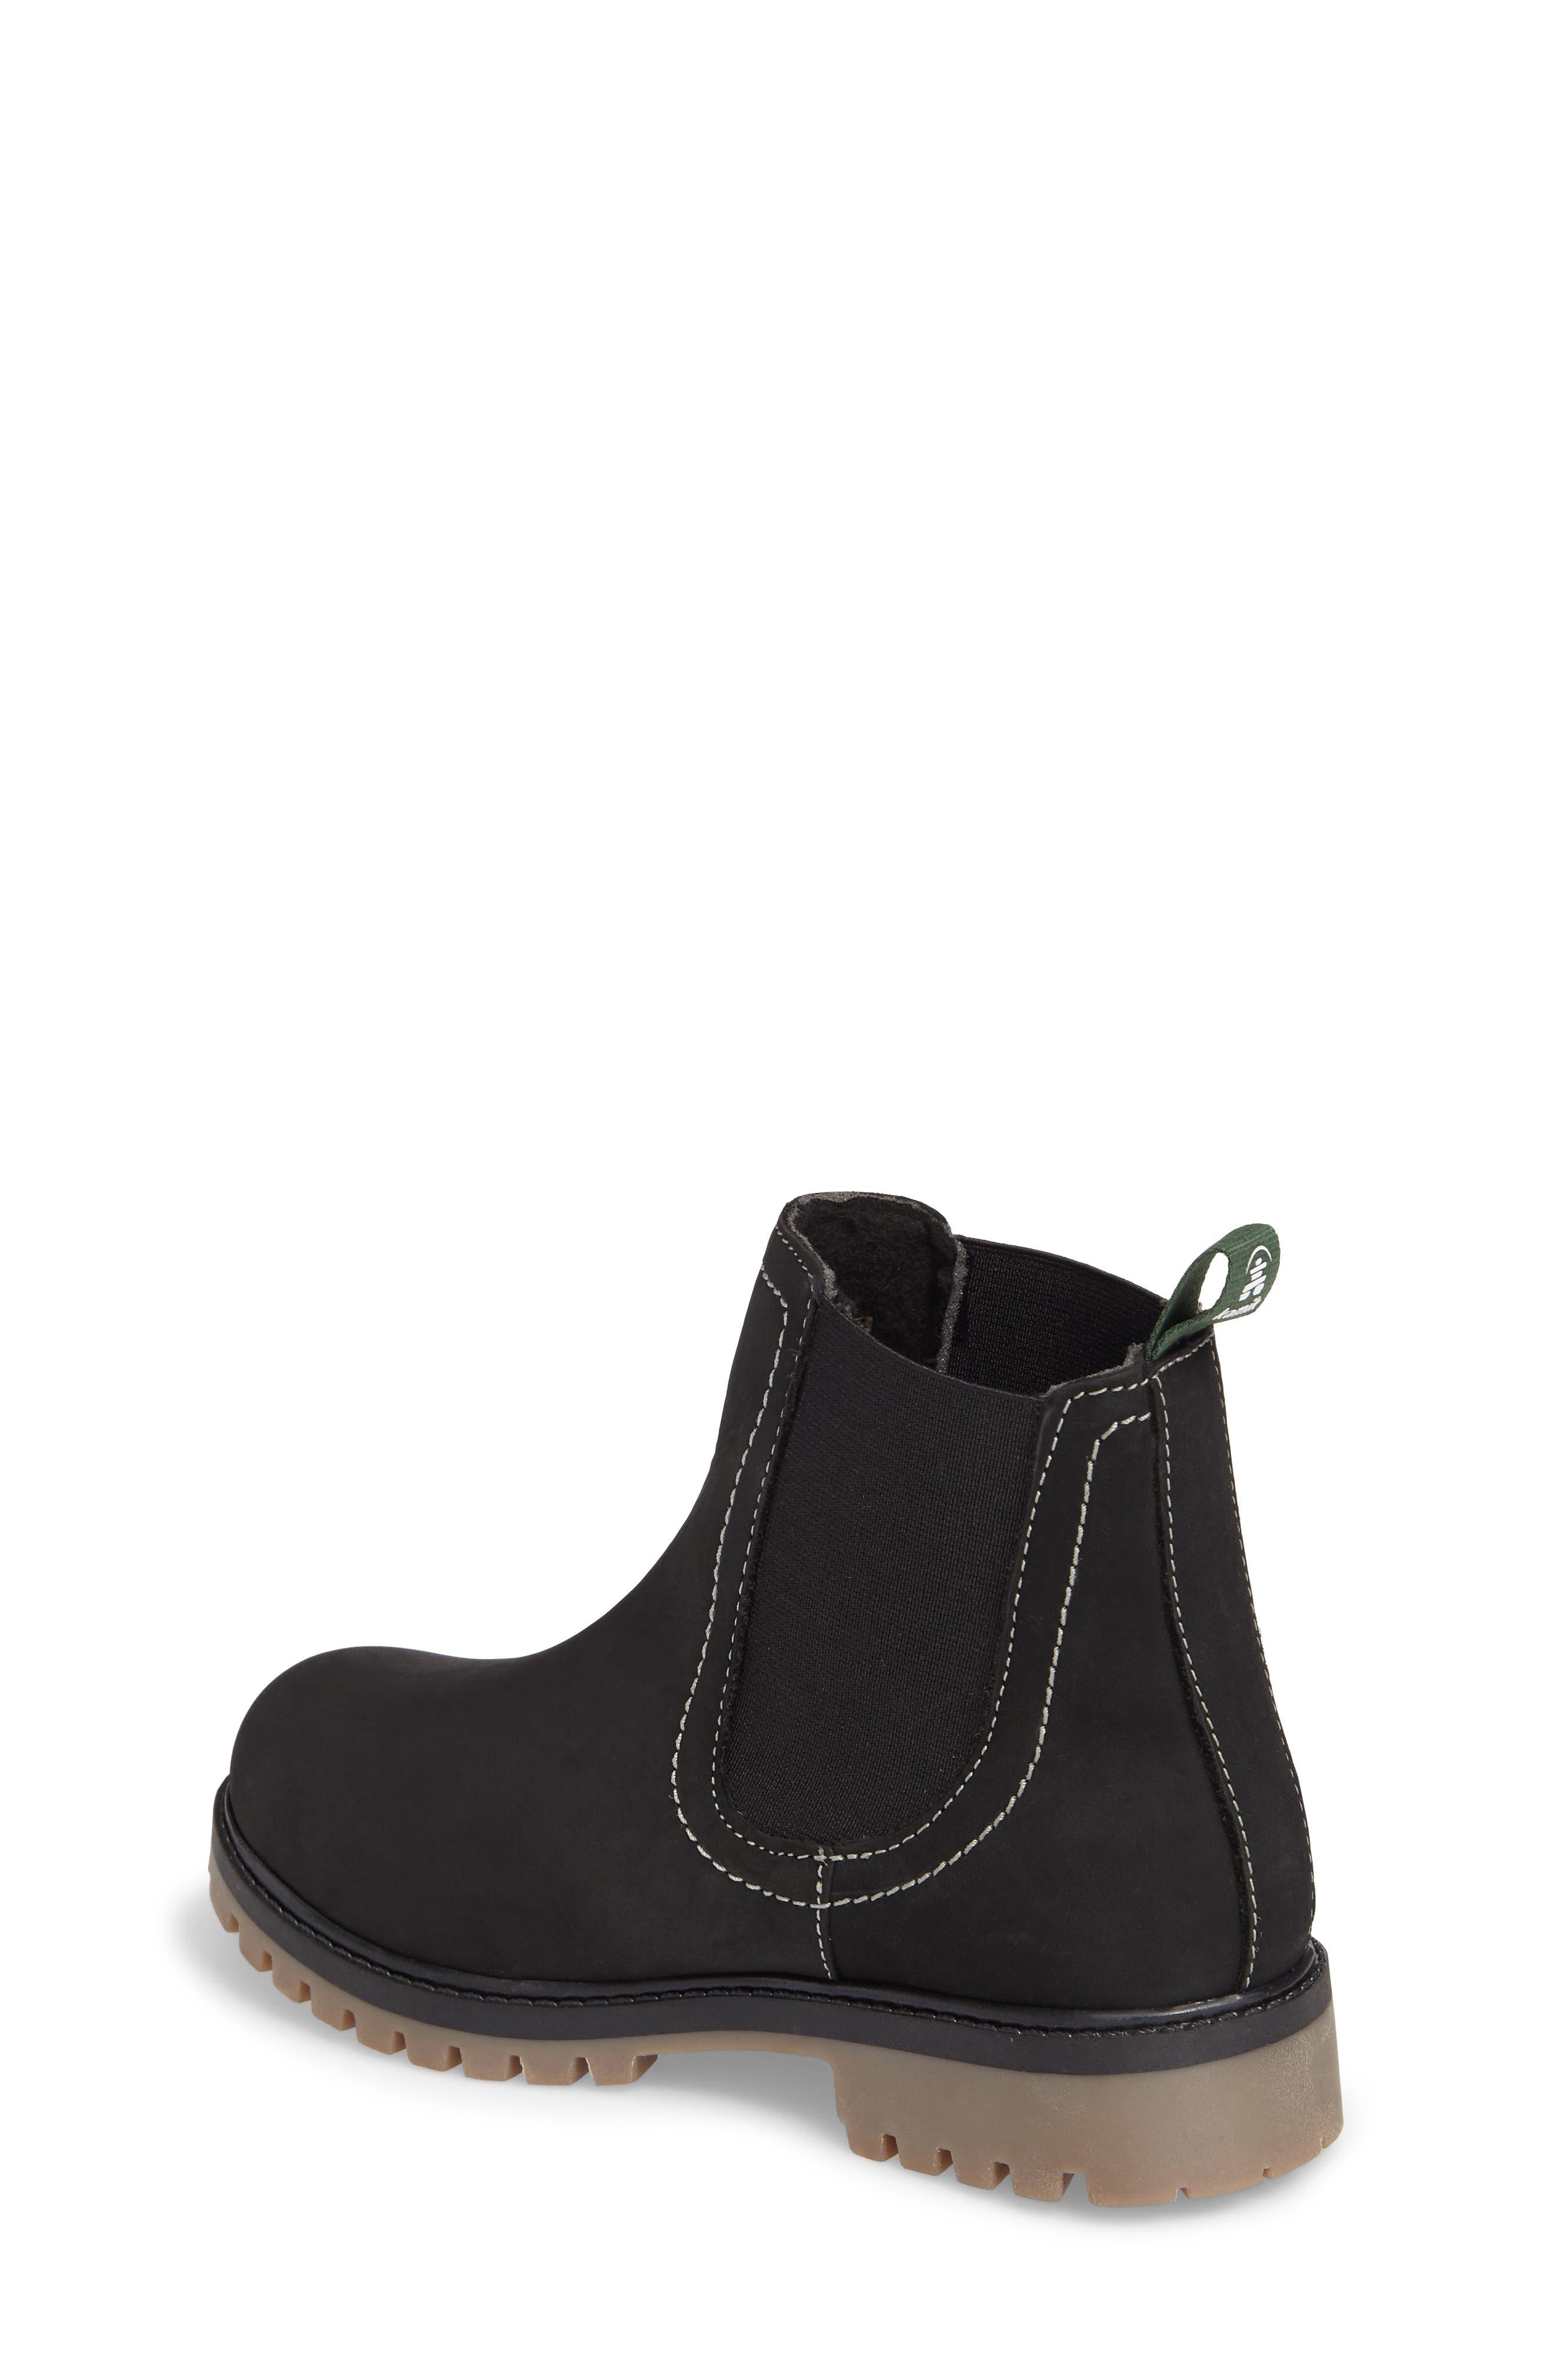 TakodaC Waterproof Chelsea Boot,                             Alternate thumbnail 2, color,                             Black